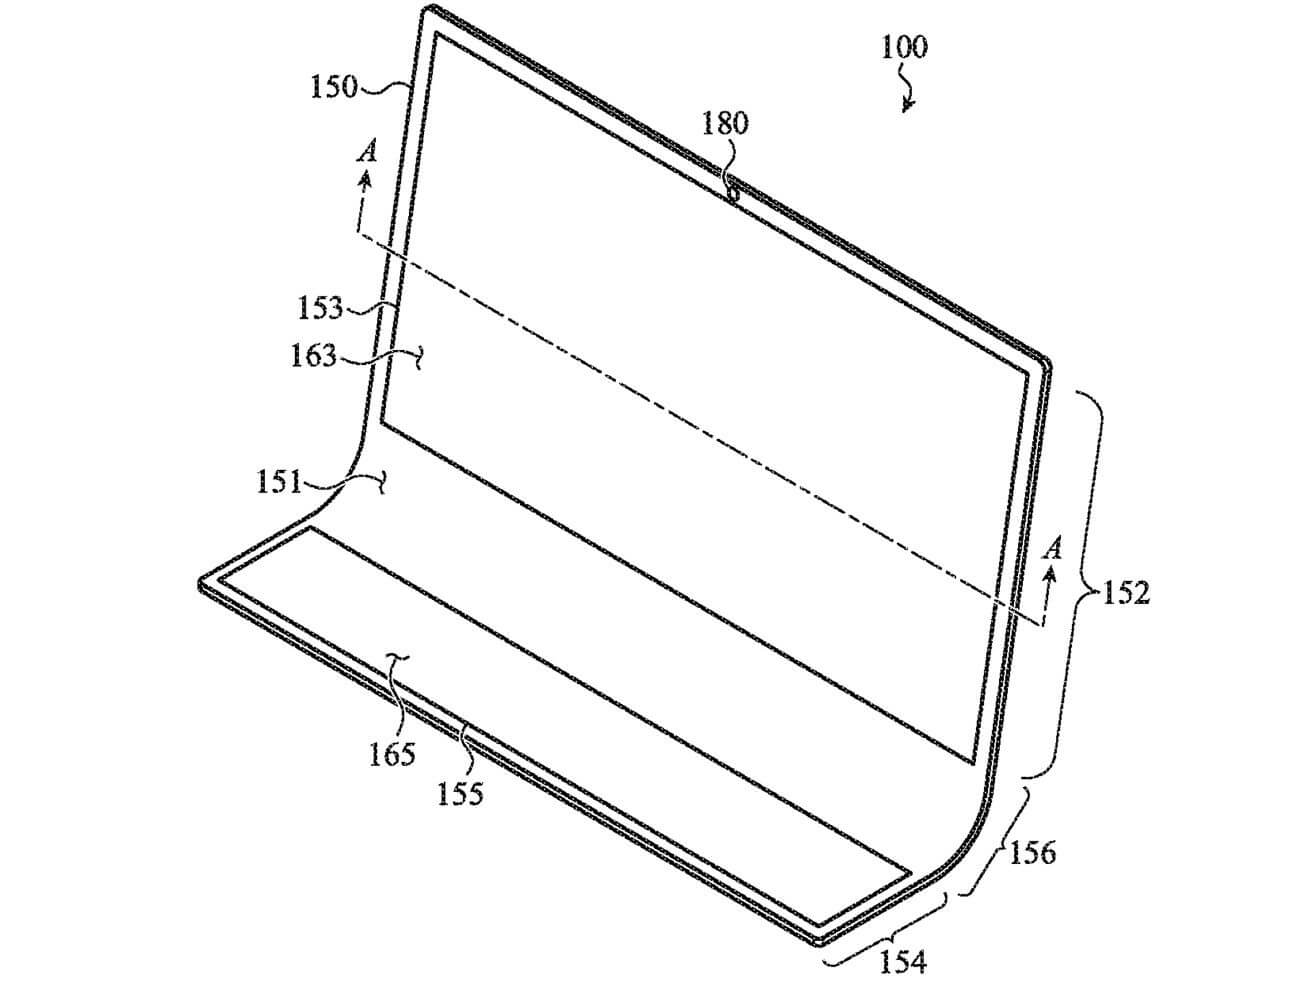 iMac Patente